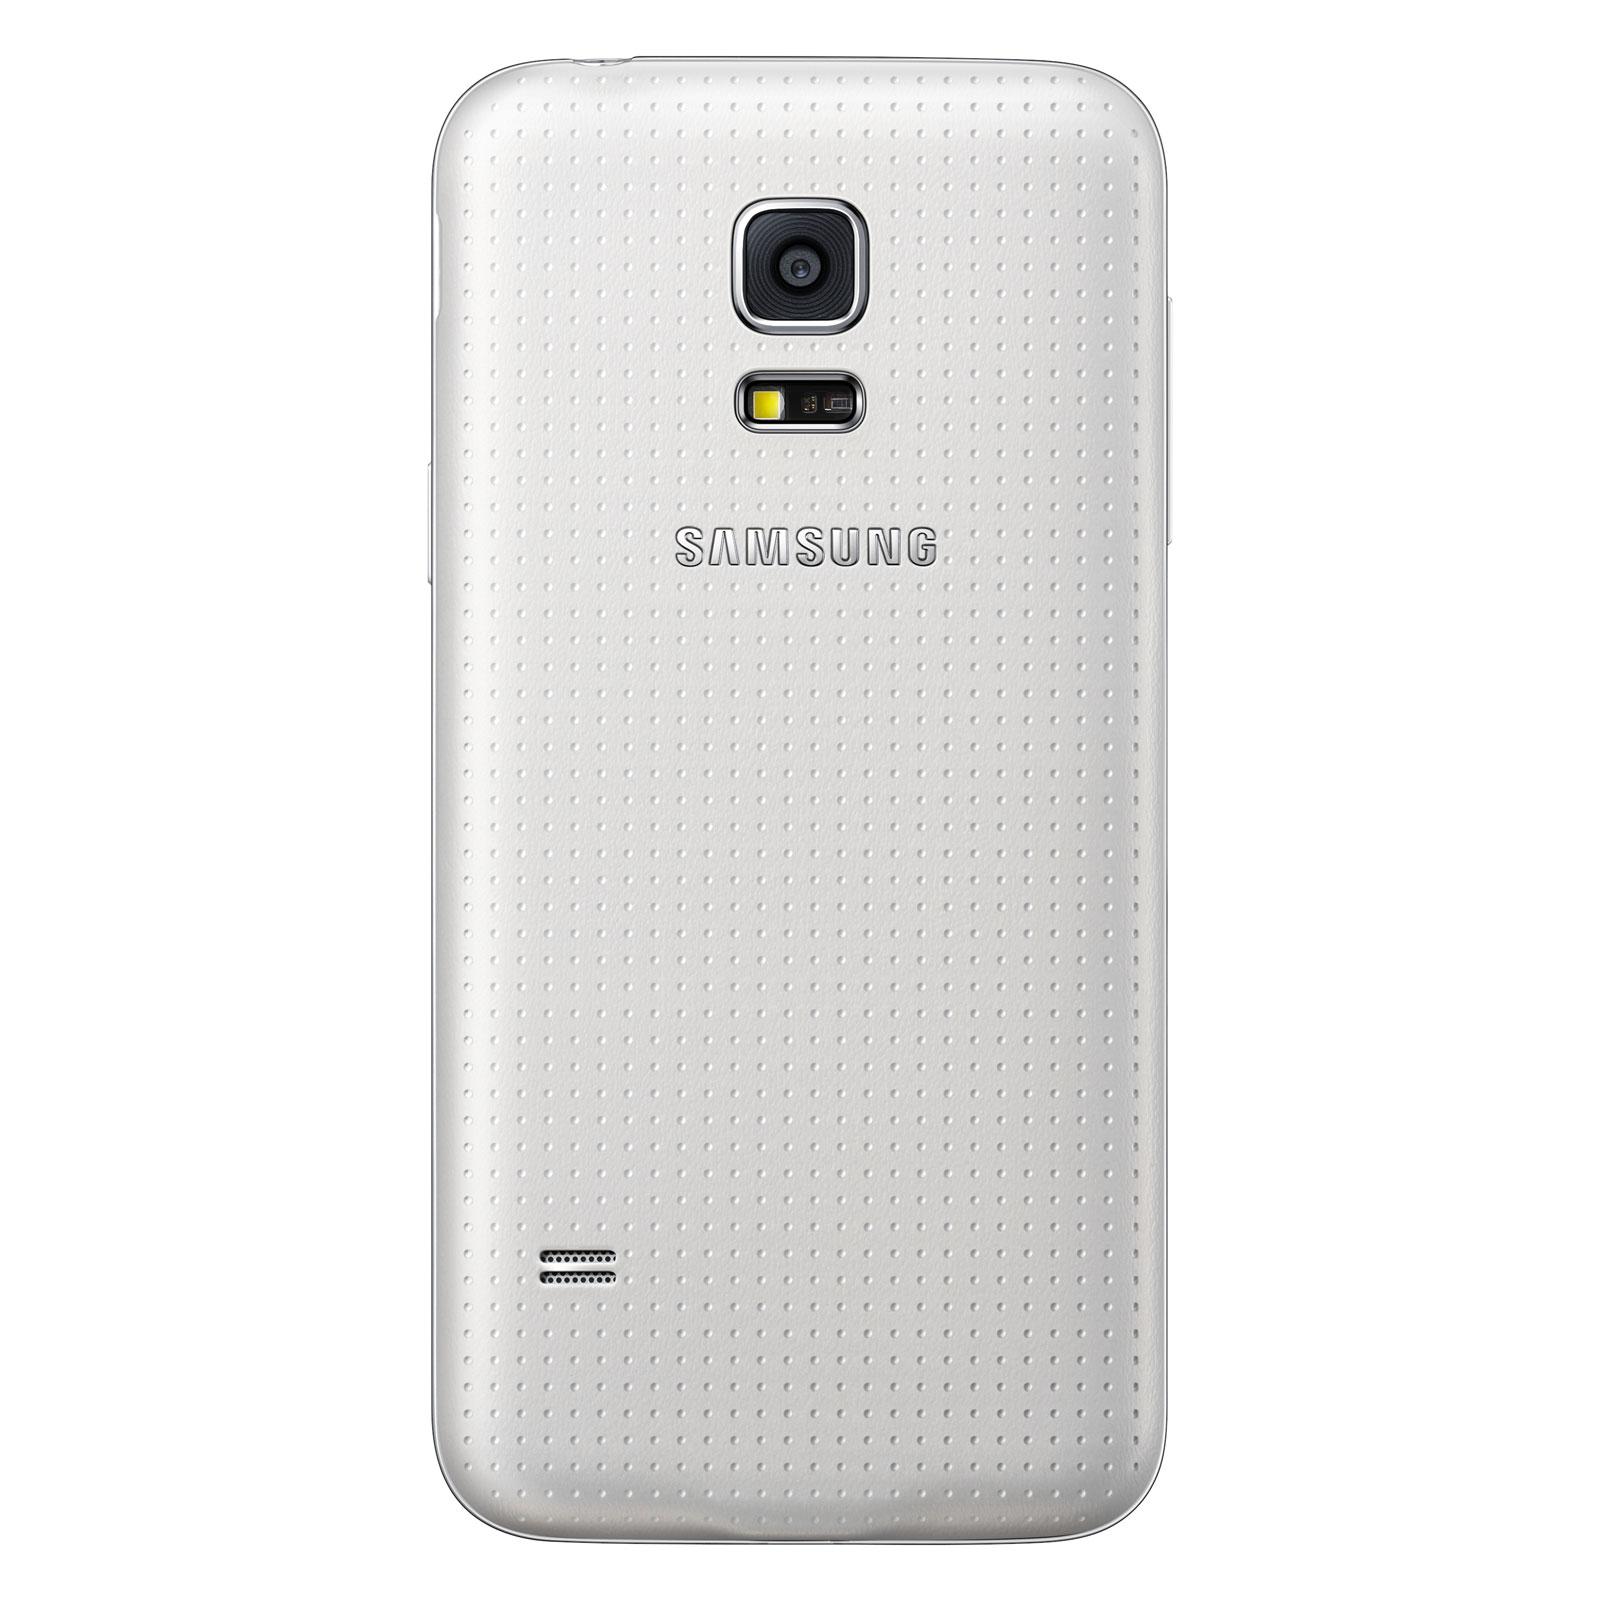 samsung galaxy s5 mini sm g800 blanc 16 go mobile. Black Bedroom Furniture Sets. Home Design Ideas